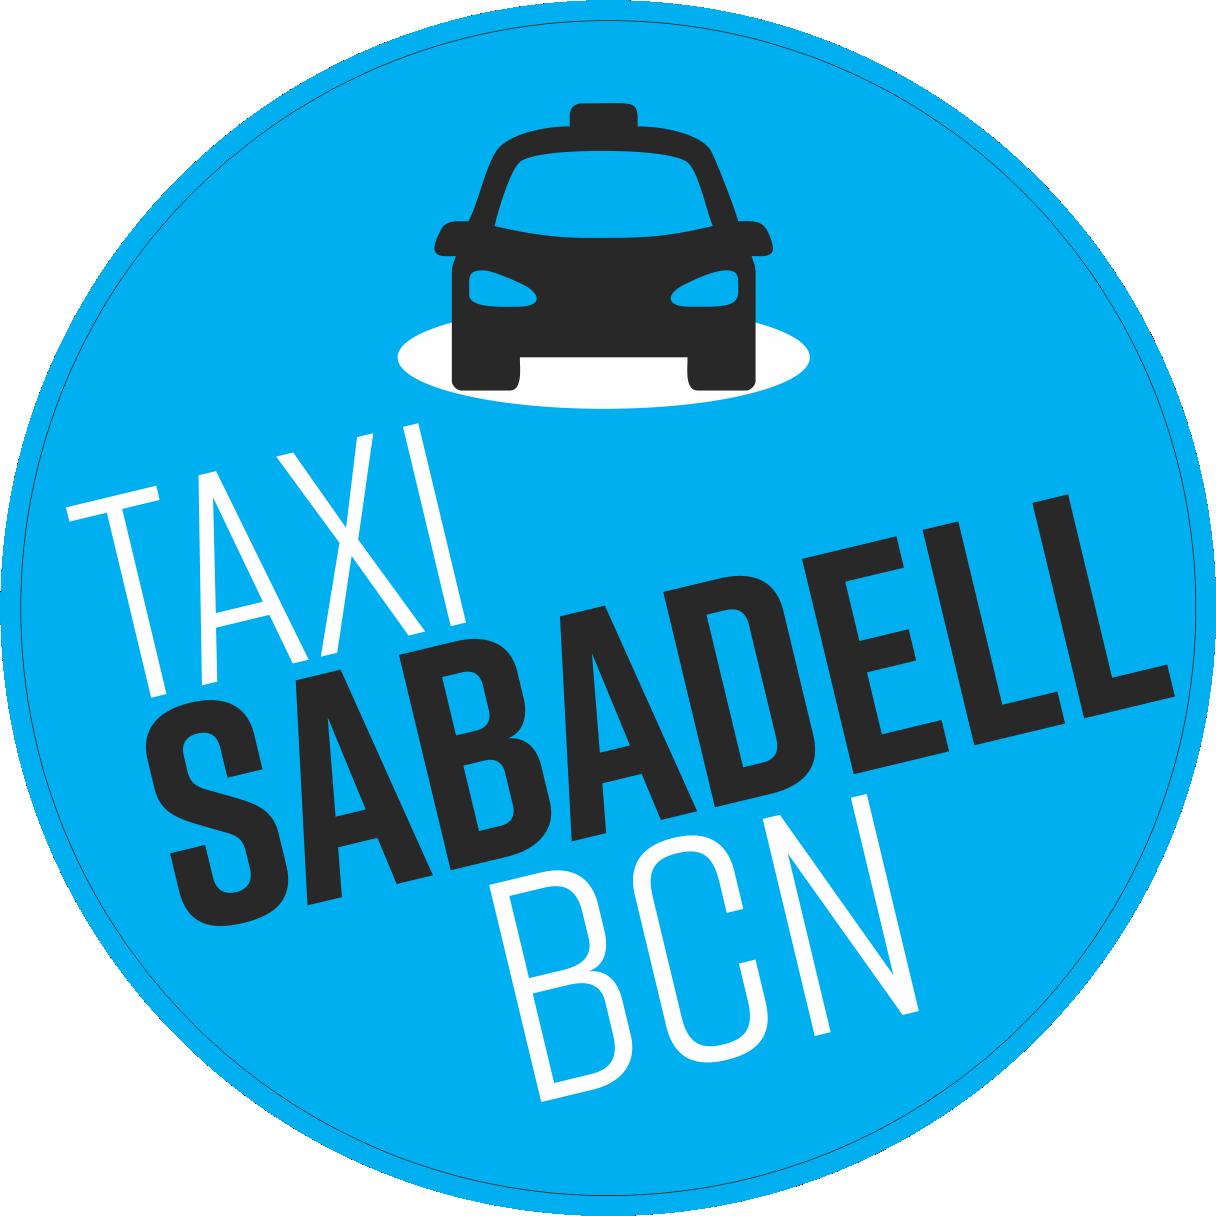 Taxi Sabadell